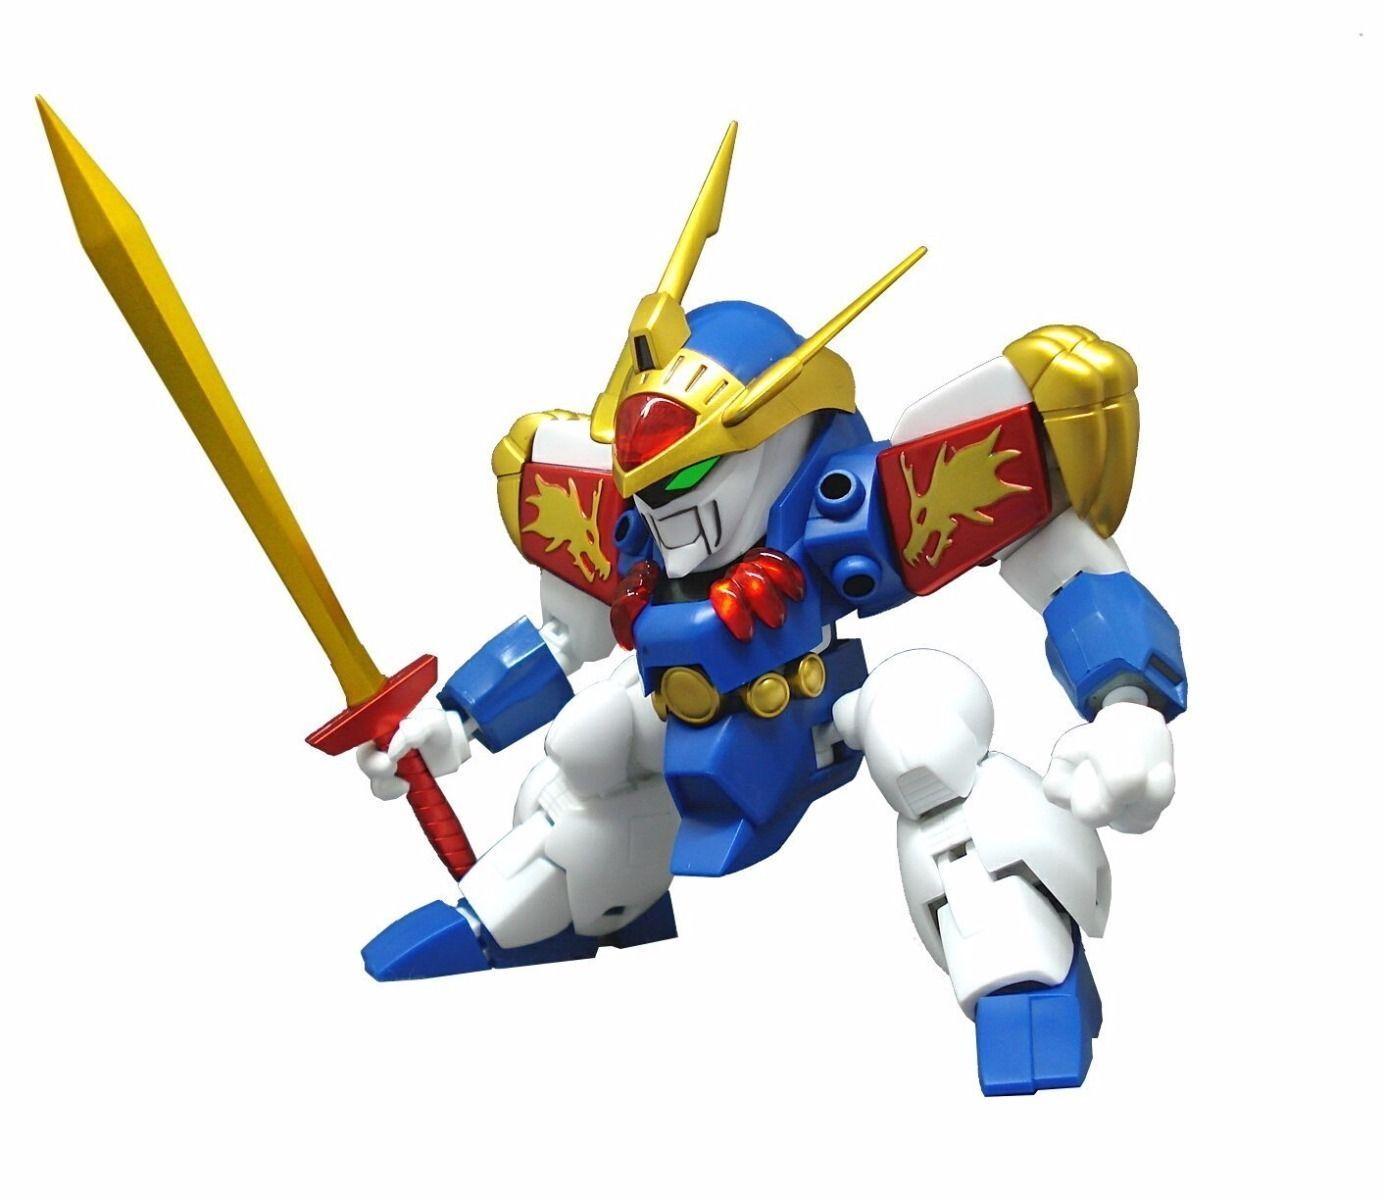 ROBOT SPIRITS Side MASHIN Hero Wataru RYUJINMARU Action Figure BANDAI from Japan